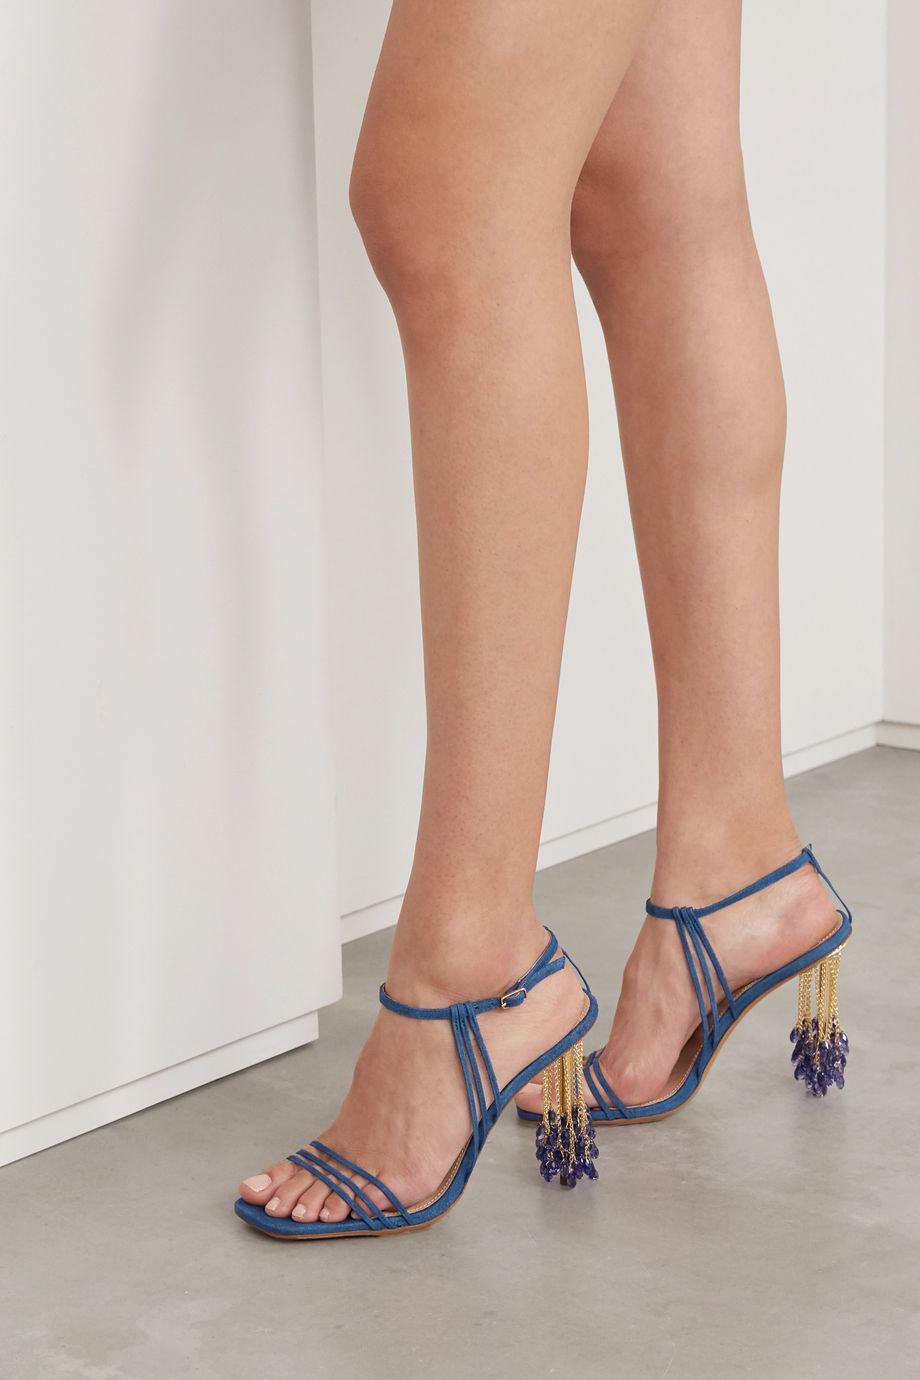 Jacquemus Embellished suede sandals